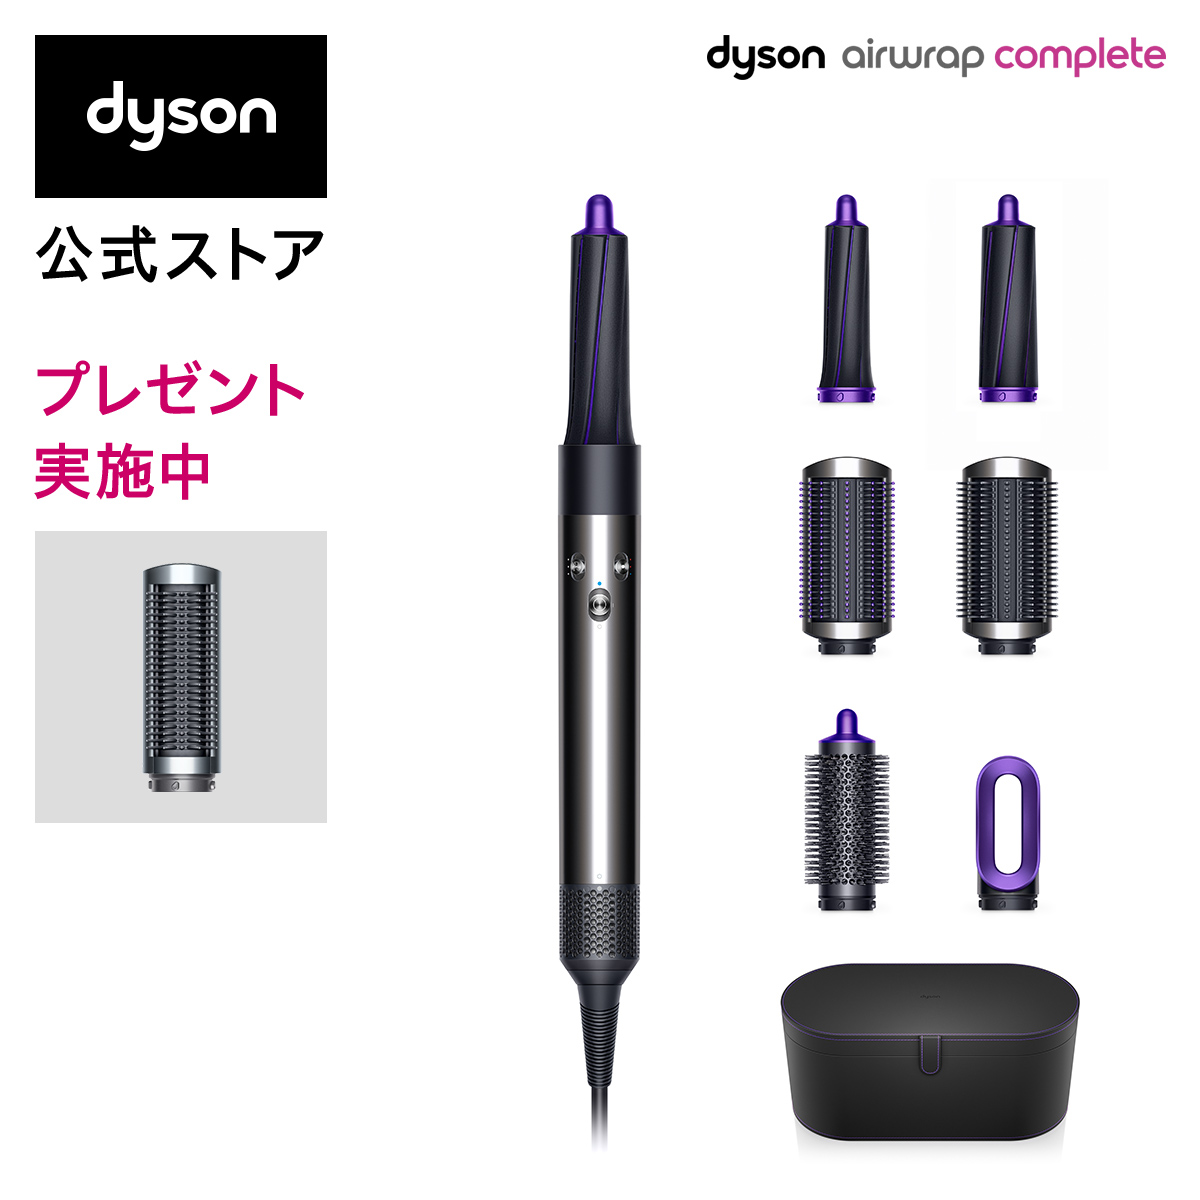 Dyson Airwrap Complete ダイソン エアラップ コンプリート HS01 配送員設置送料無料 PB 2月1日より新価格 ブラック 特別プレゼント付き:別送 新品 パープル COMP